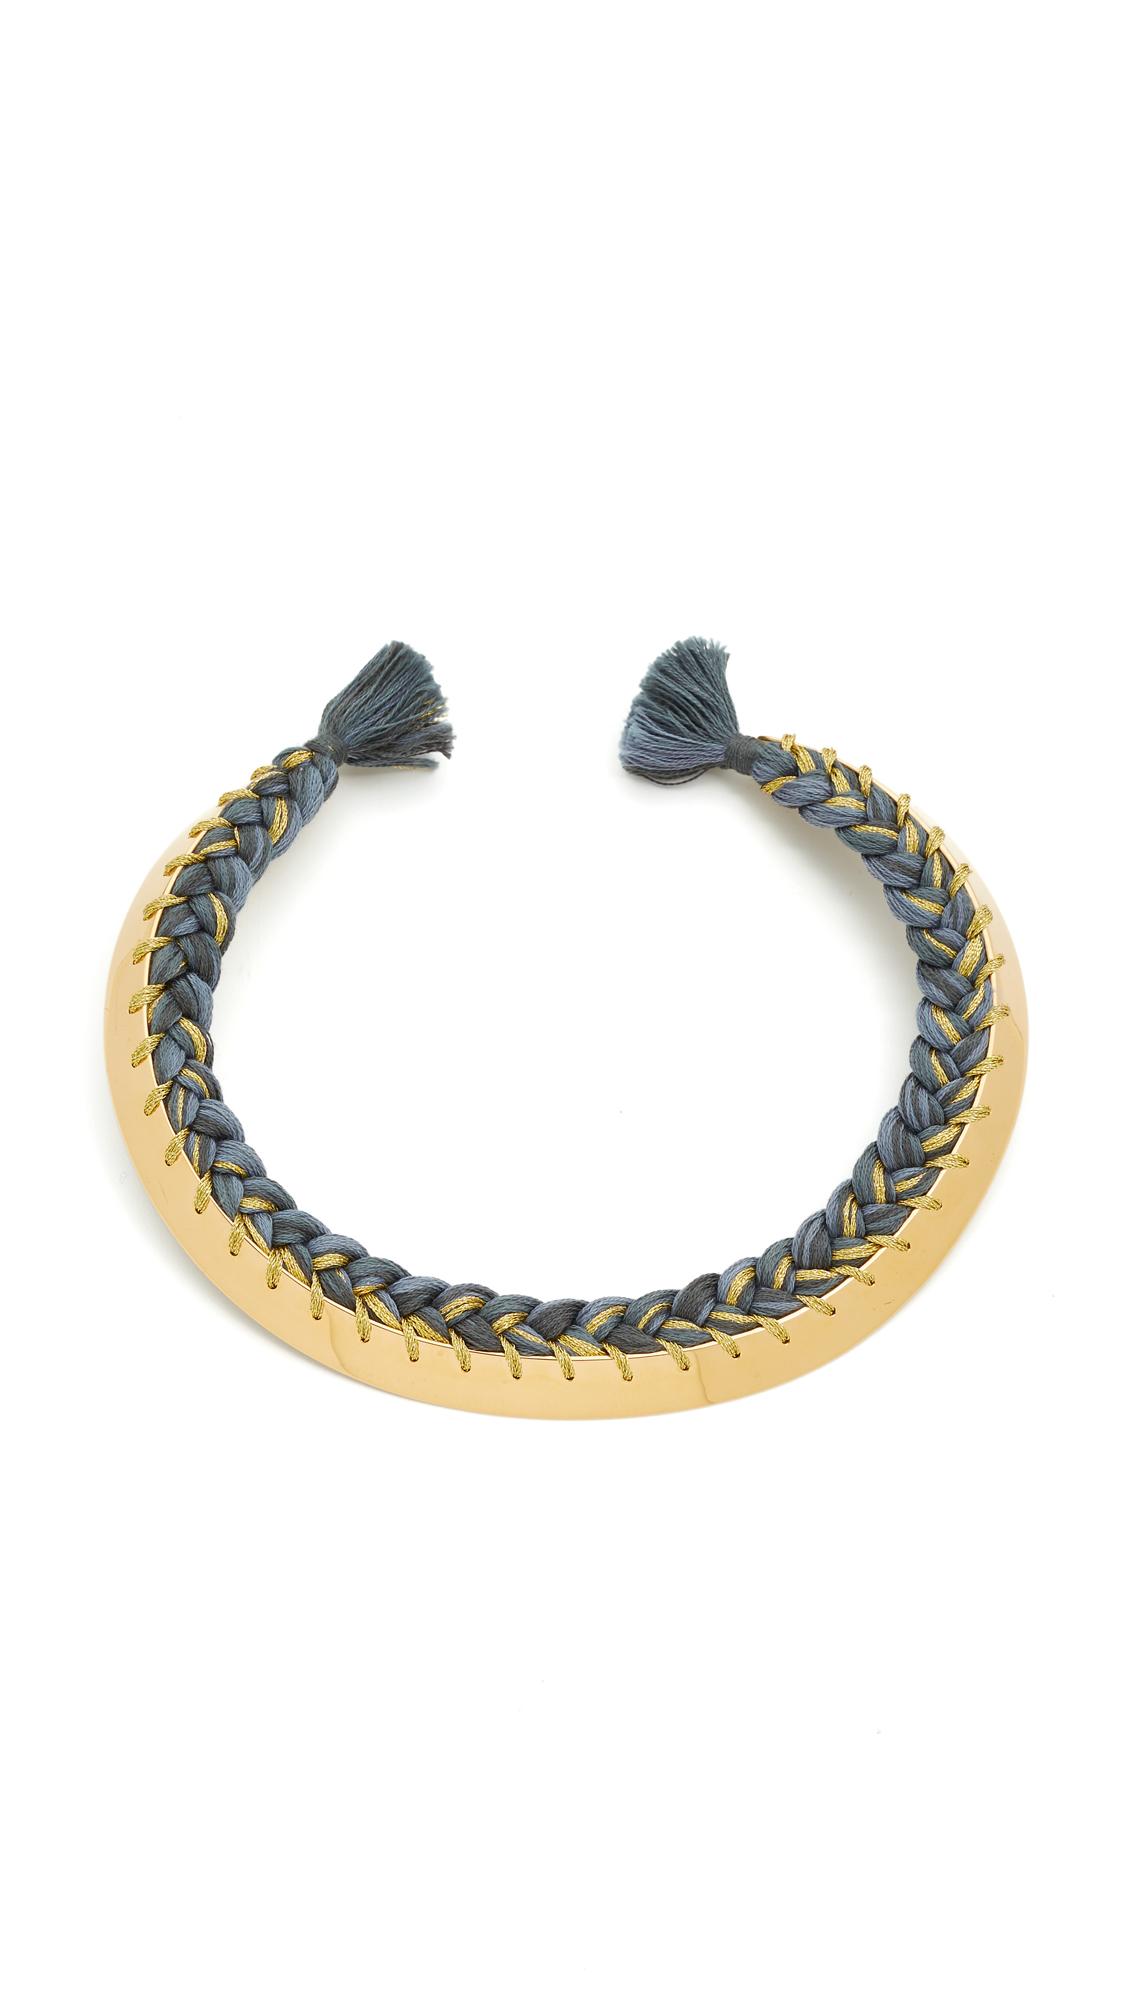 Aurelie Bidermann Copacabana Necklace - Charcoal at Shopbop